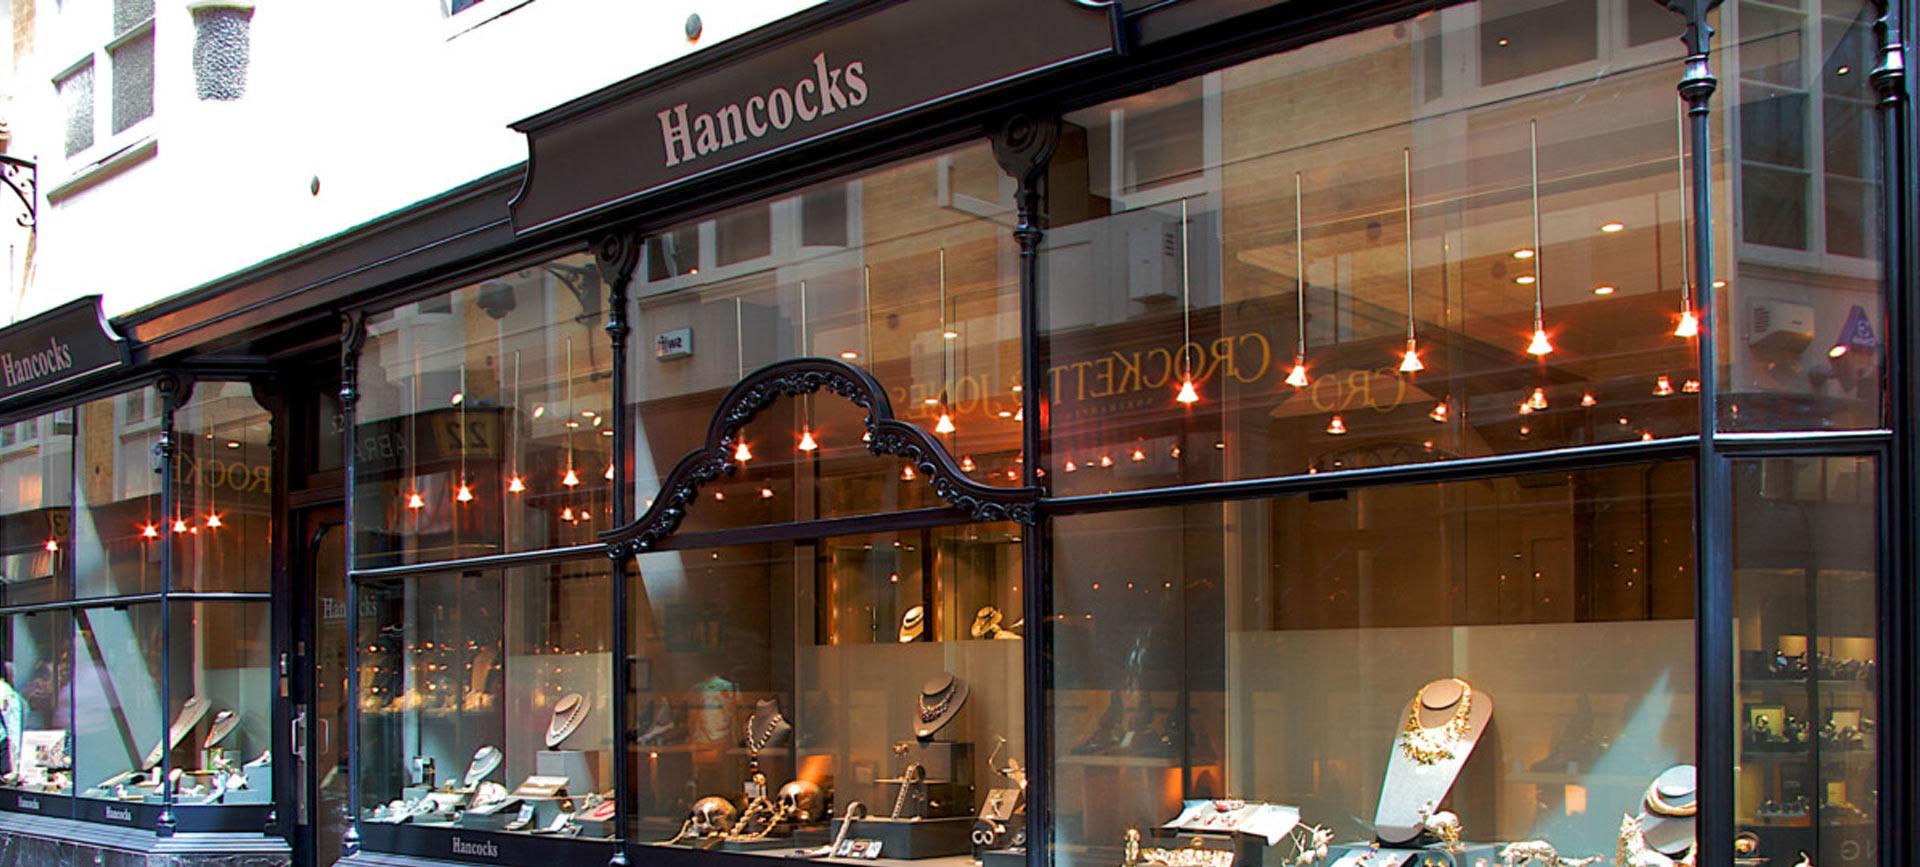 Hancocks & Co. Ltd